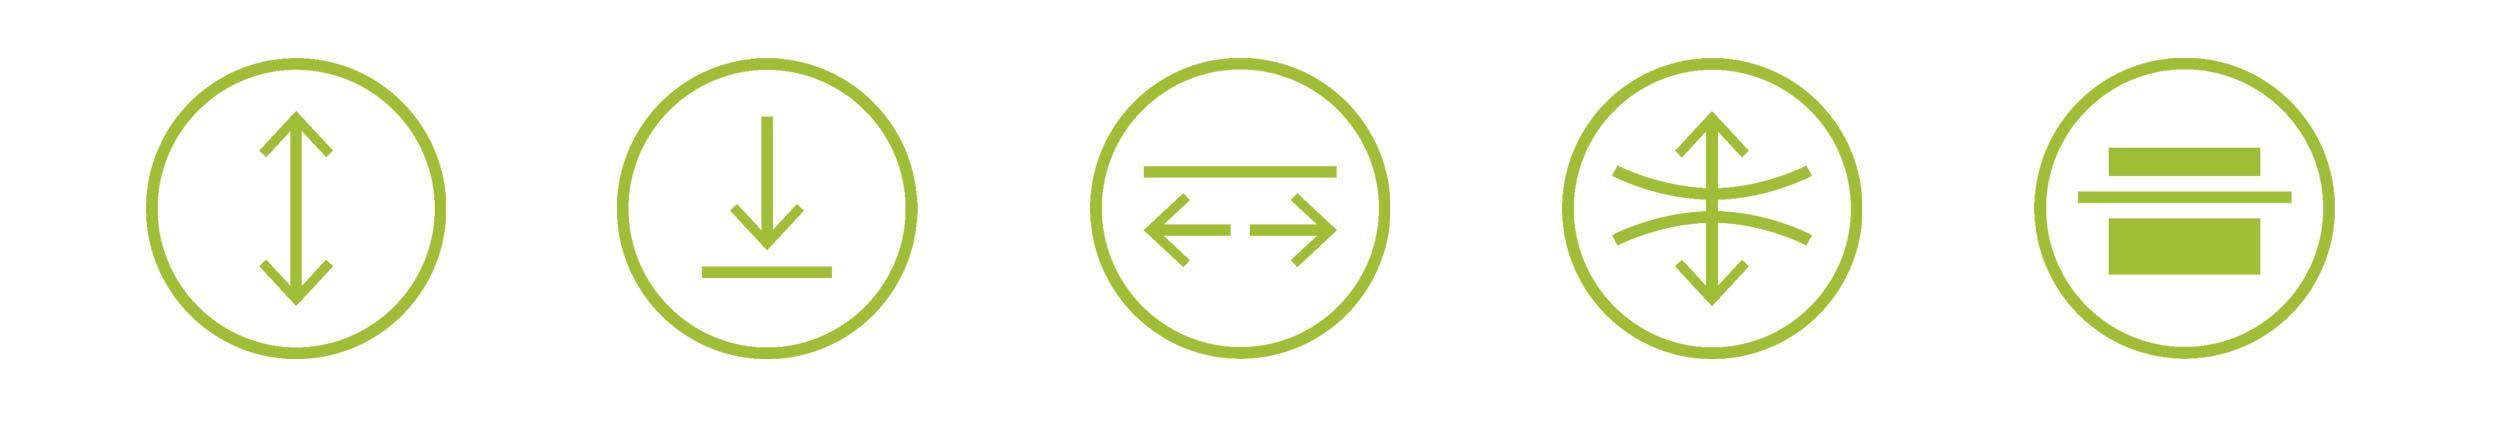 lehnstein-werbung-koblenz-proline-fibretec-symbols